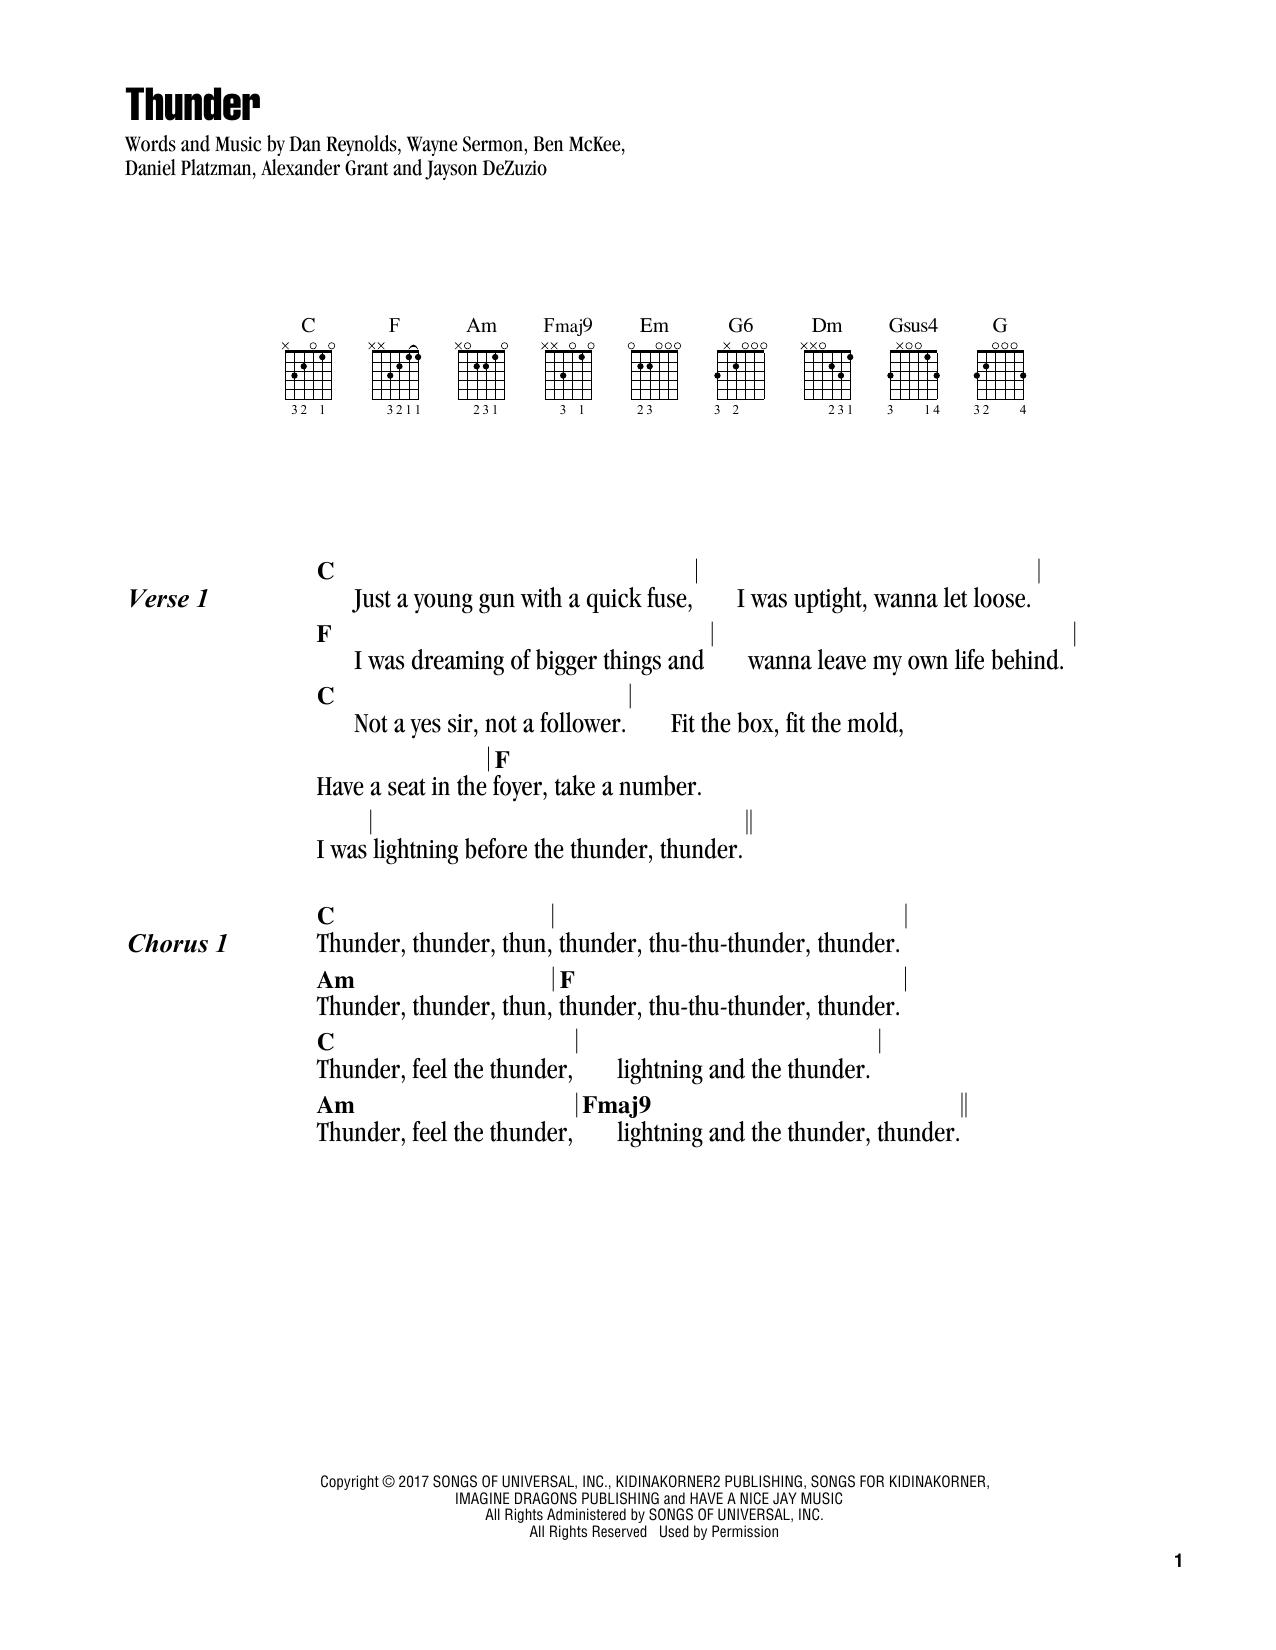 Guitar chord sheet music at stantons sheet music imagine dragons thunder hexwebz Gallery